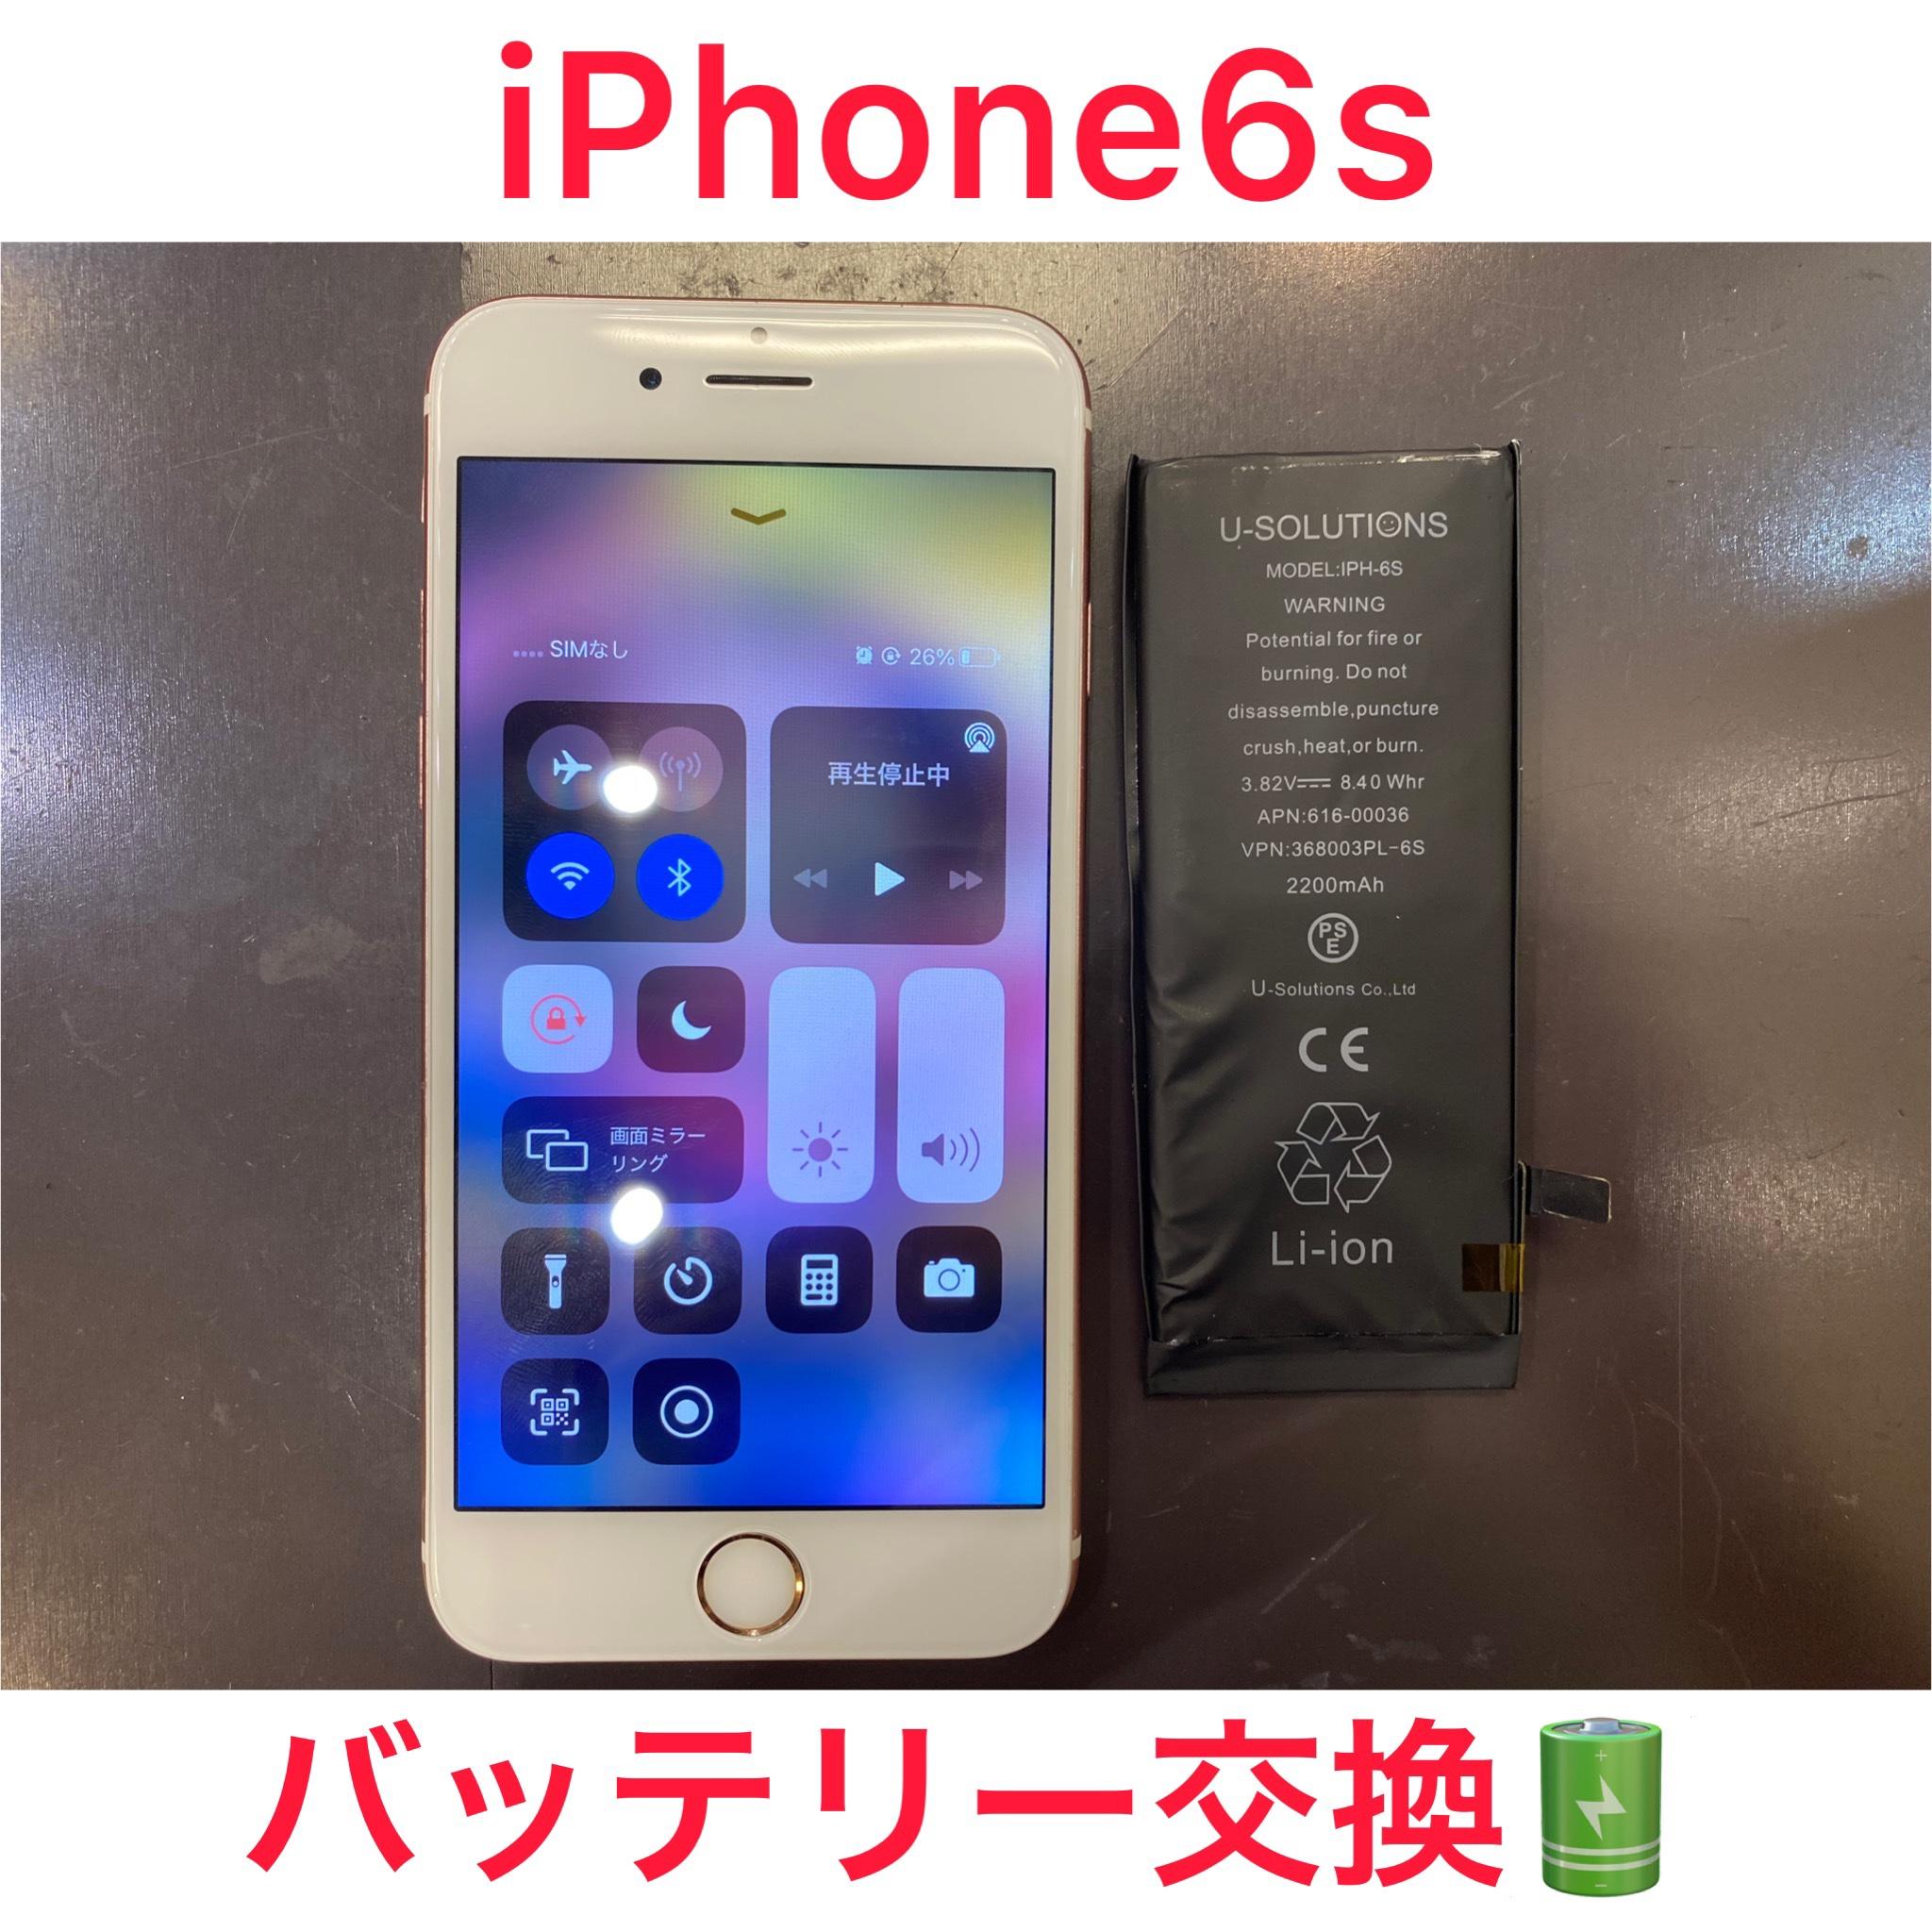 ★iPhone6s・バッテリー交換・東区よりお越しのお客様